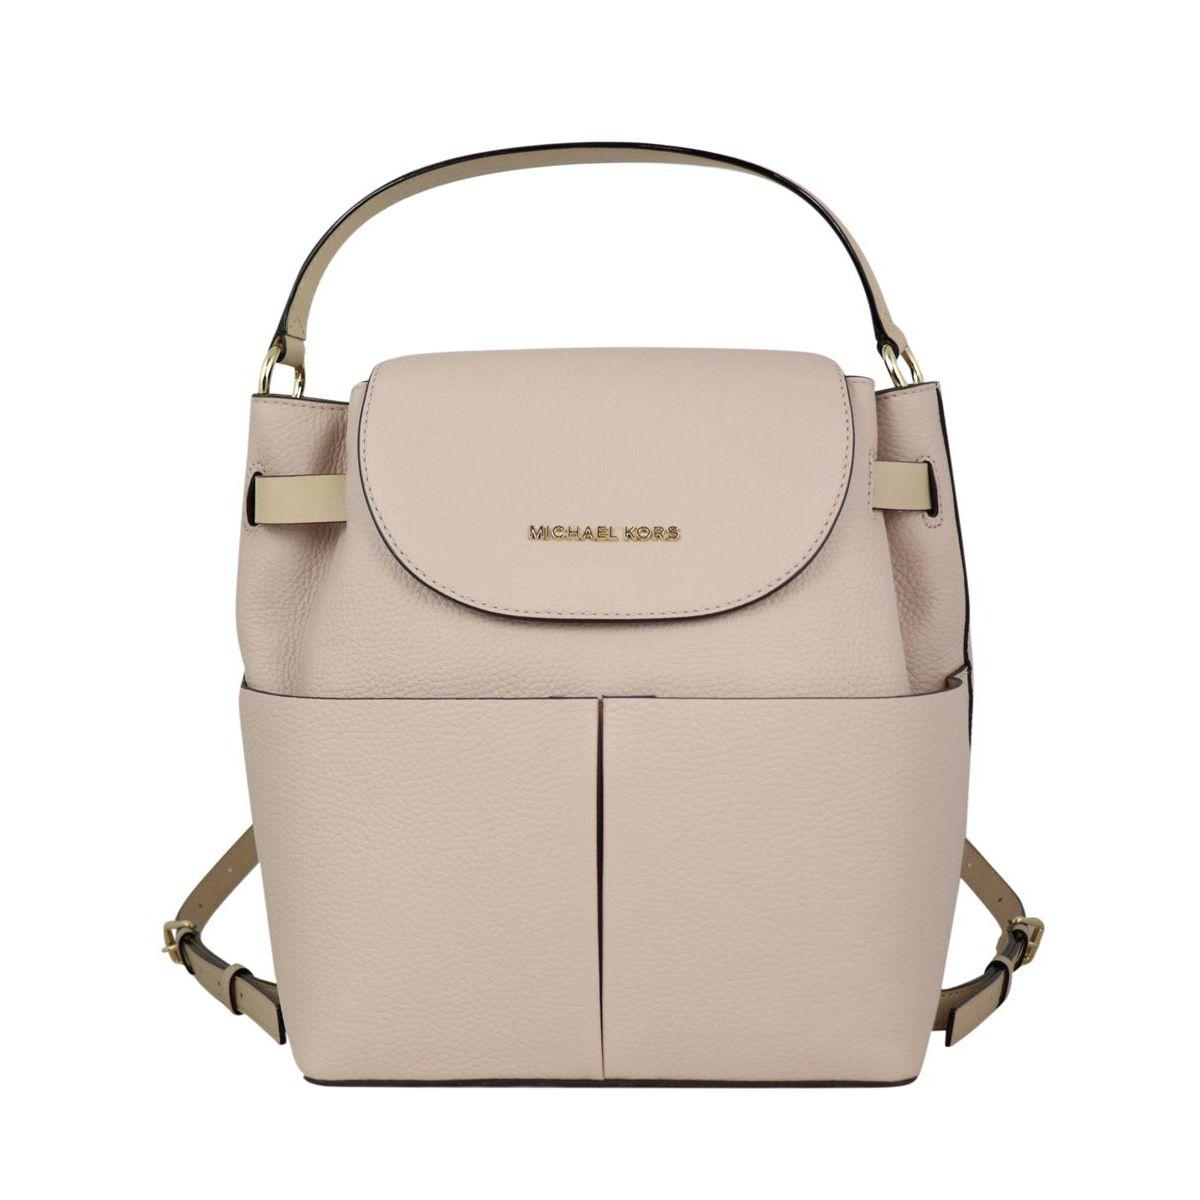 Bedford leather backpack Powder pink Michael Kors